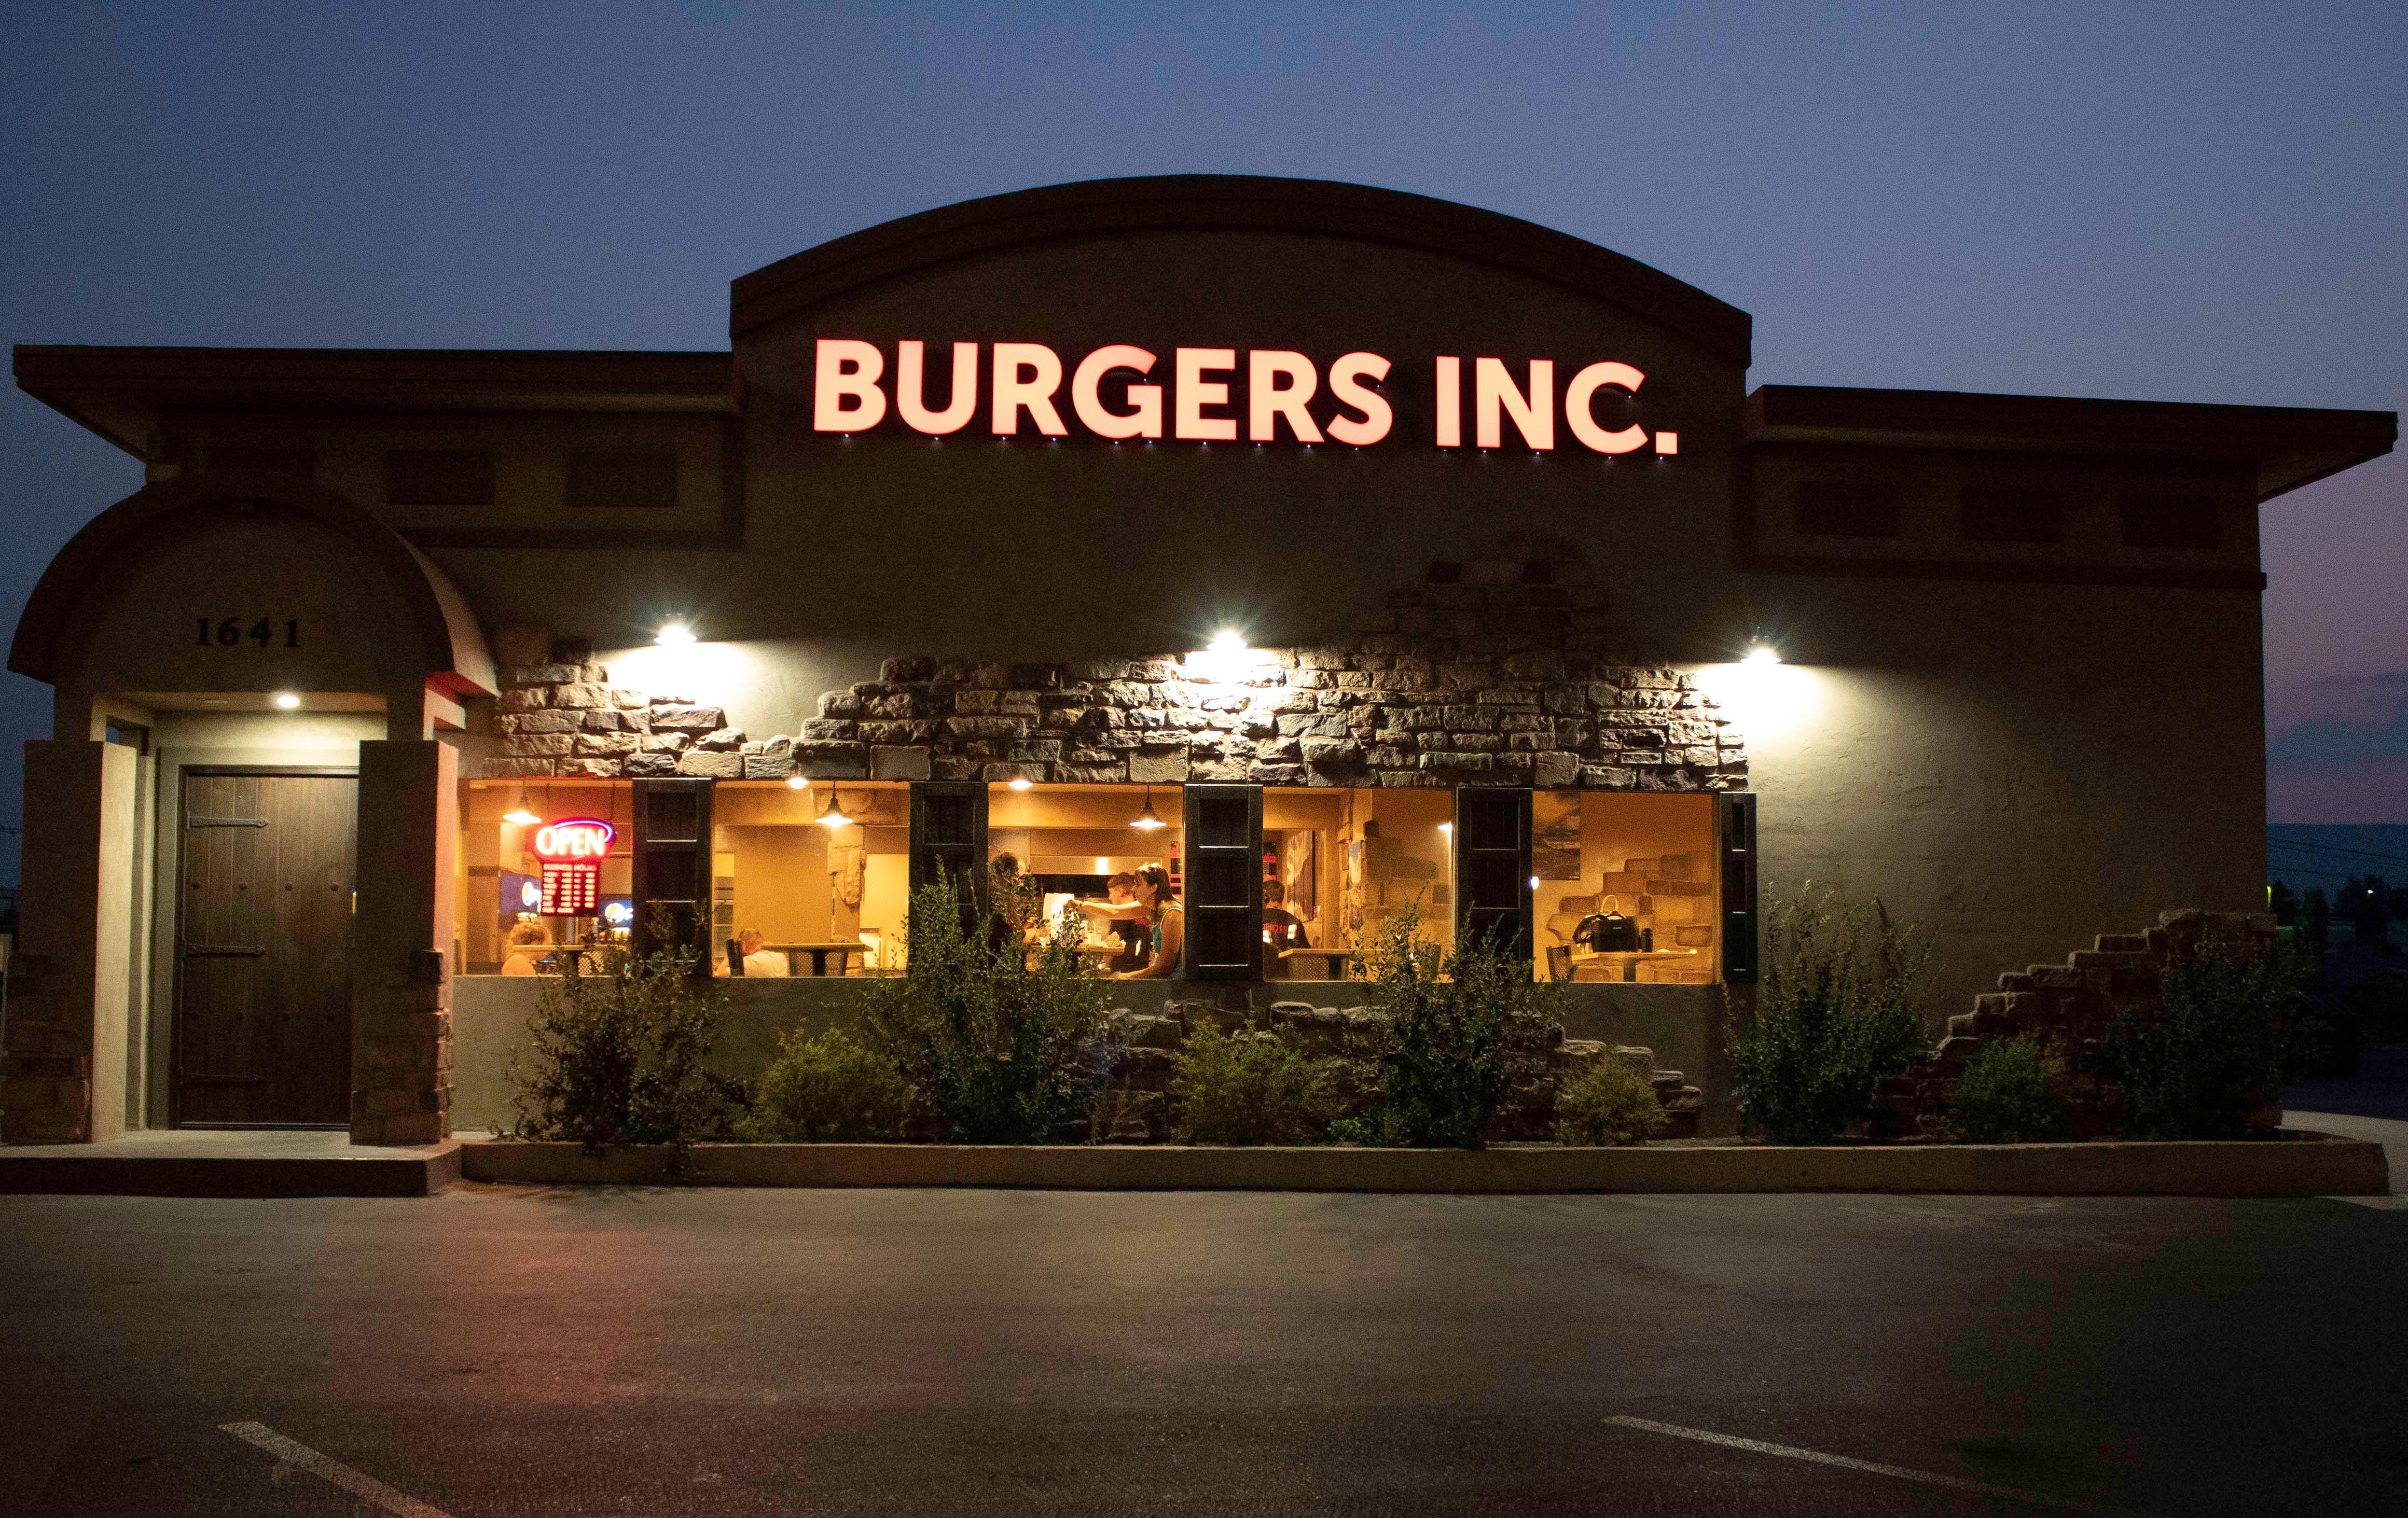 Burgers Inc. image 8